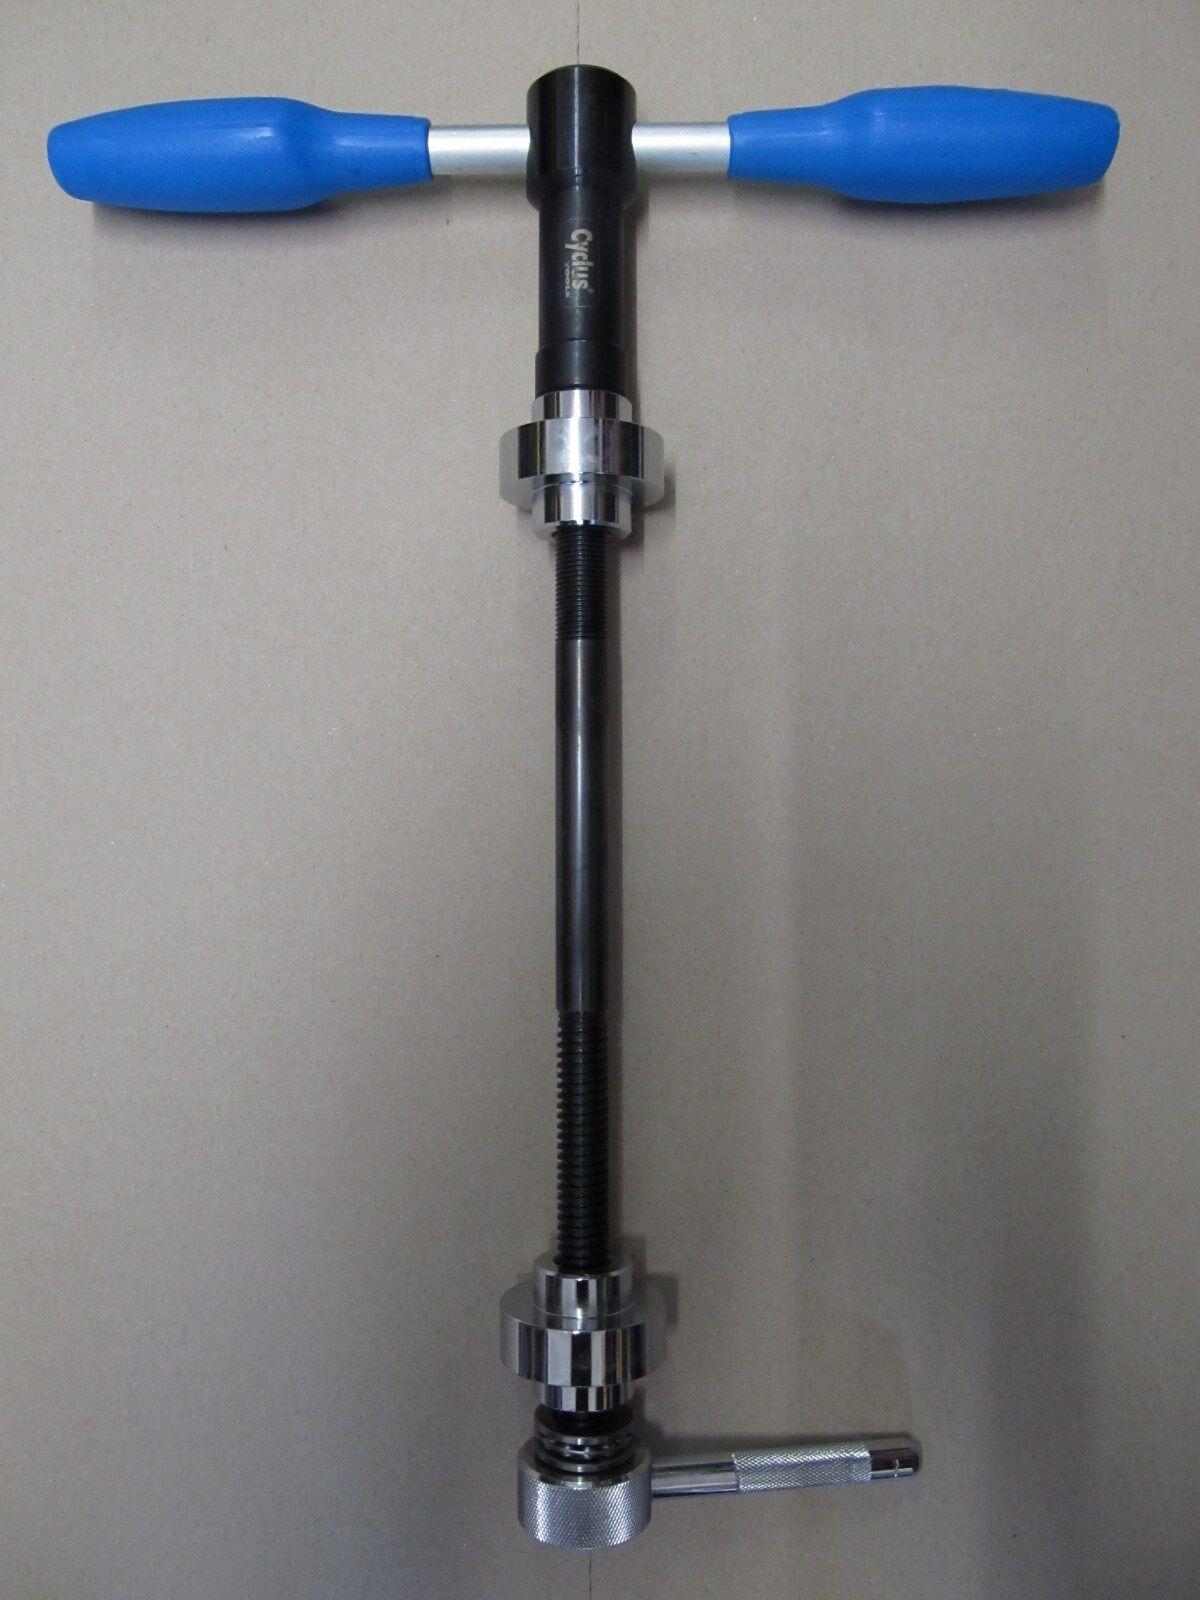 Cyclus Steuersatz Einpreß Werkzeug Profi NEU Semi-Integriert 44mm ZS44